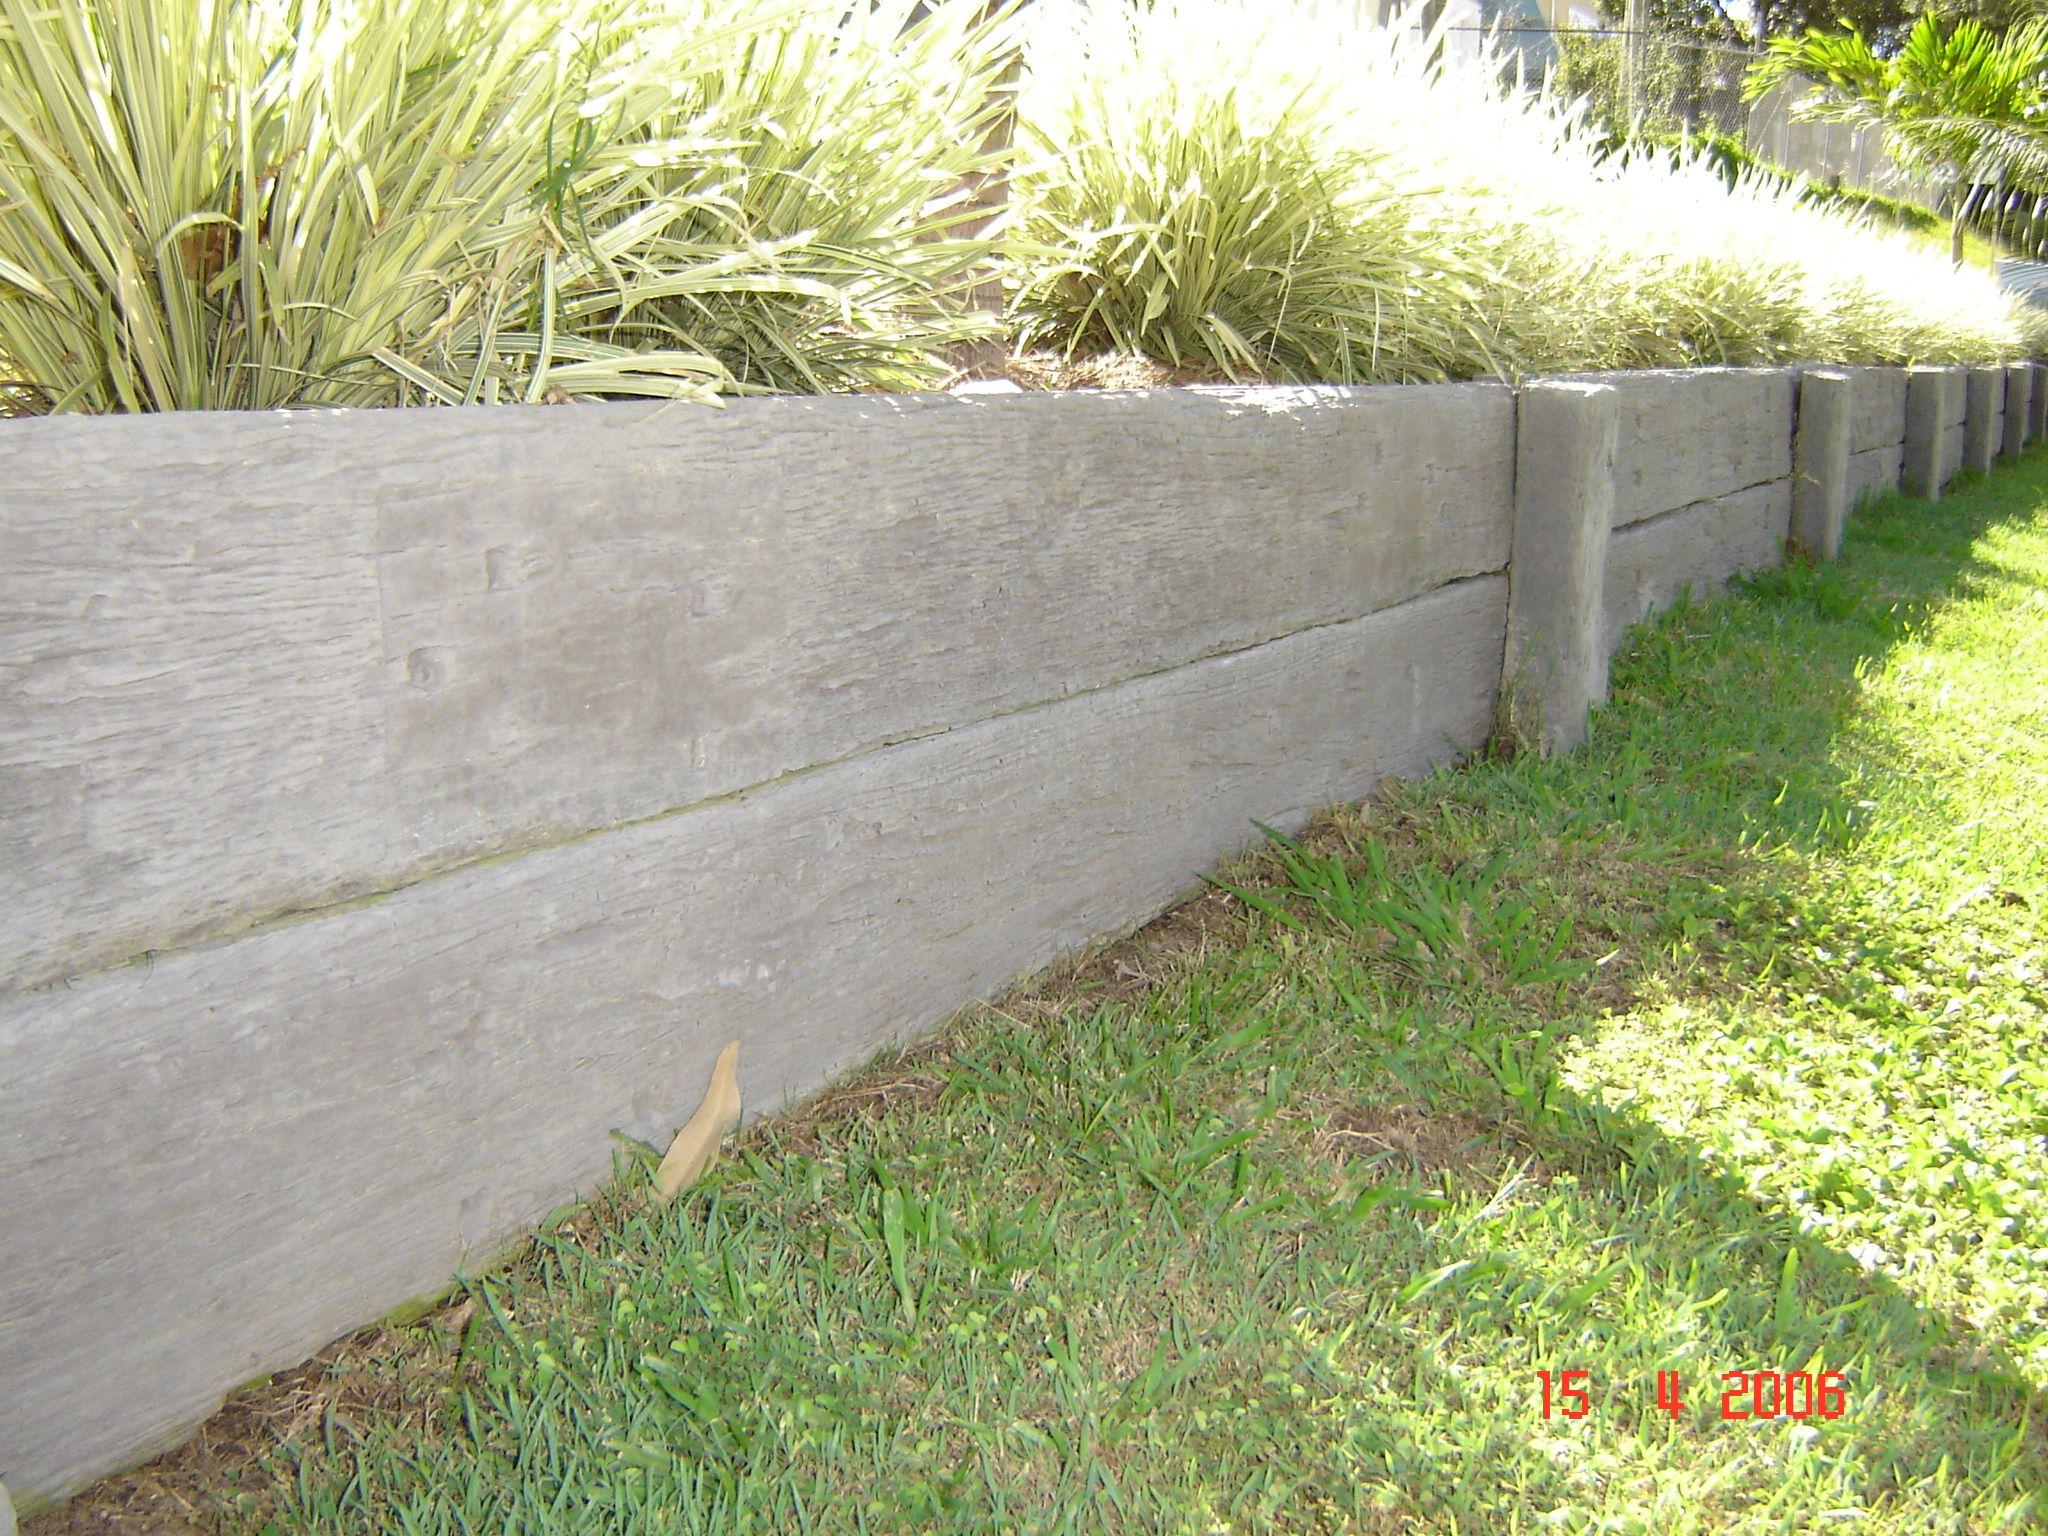 Concrete Sleepers Retaining Walls Yard Backyard Retaining Walls Garden Retaining Wall Concrete Sleepers